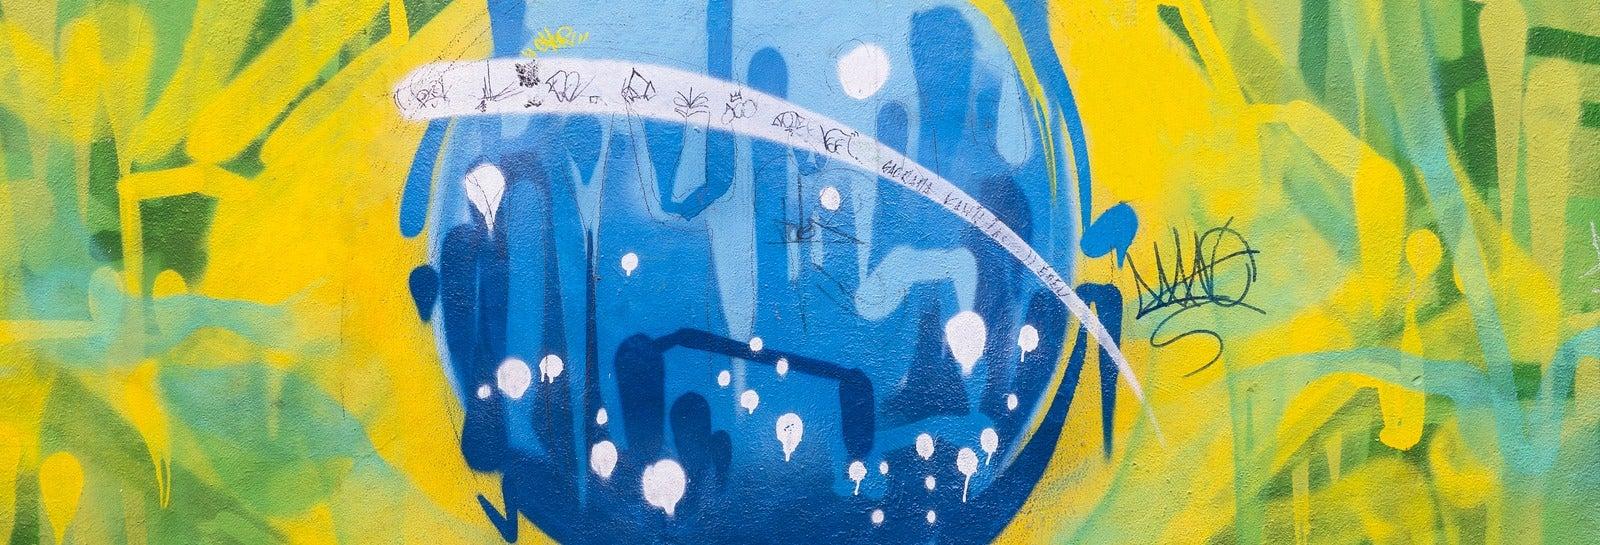 Río de Janeiro Street Art Tour